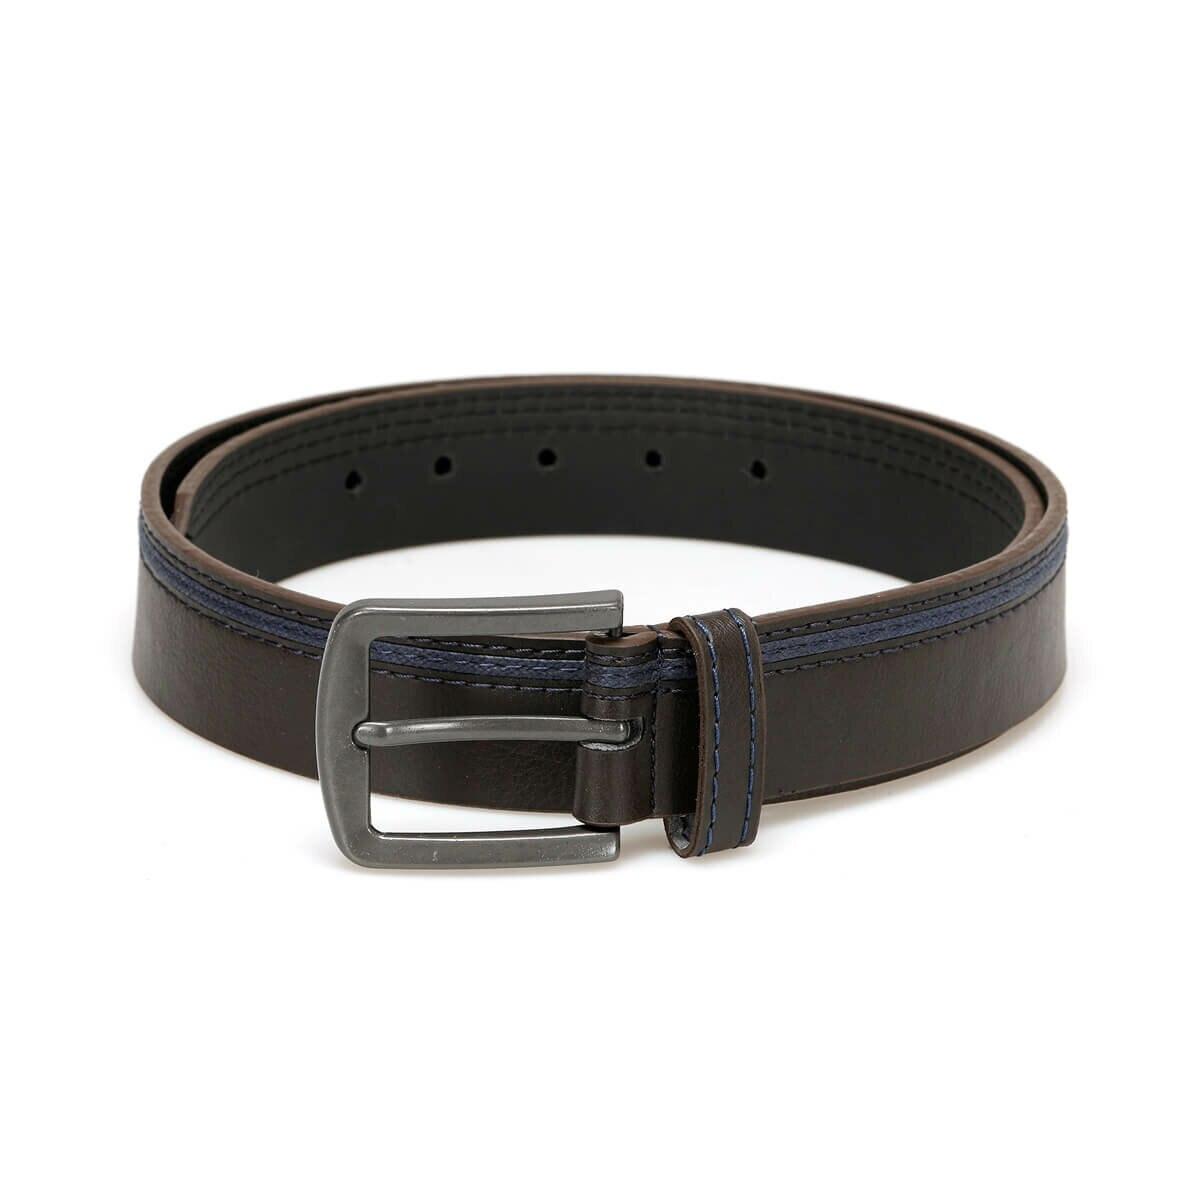 FLO MKNYL3406 Brown Men 'S Belt Garamond